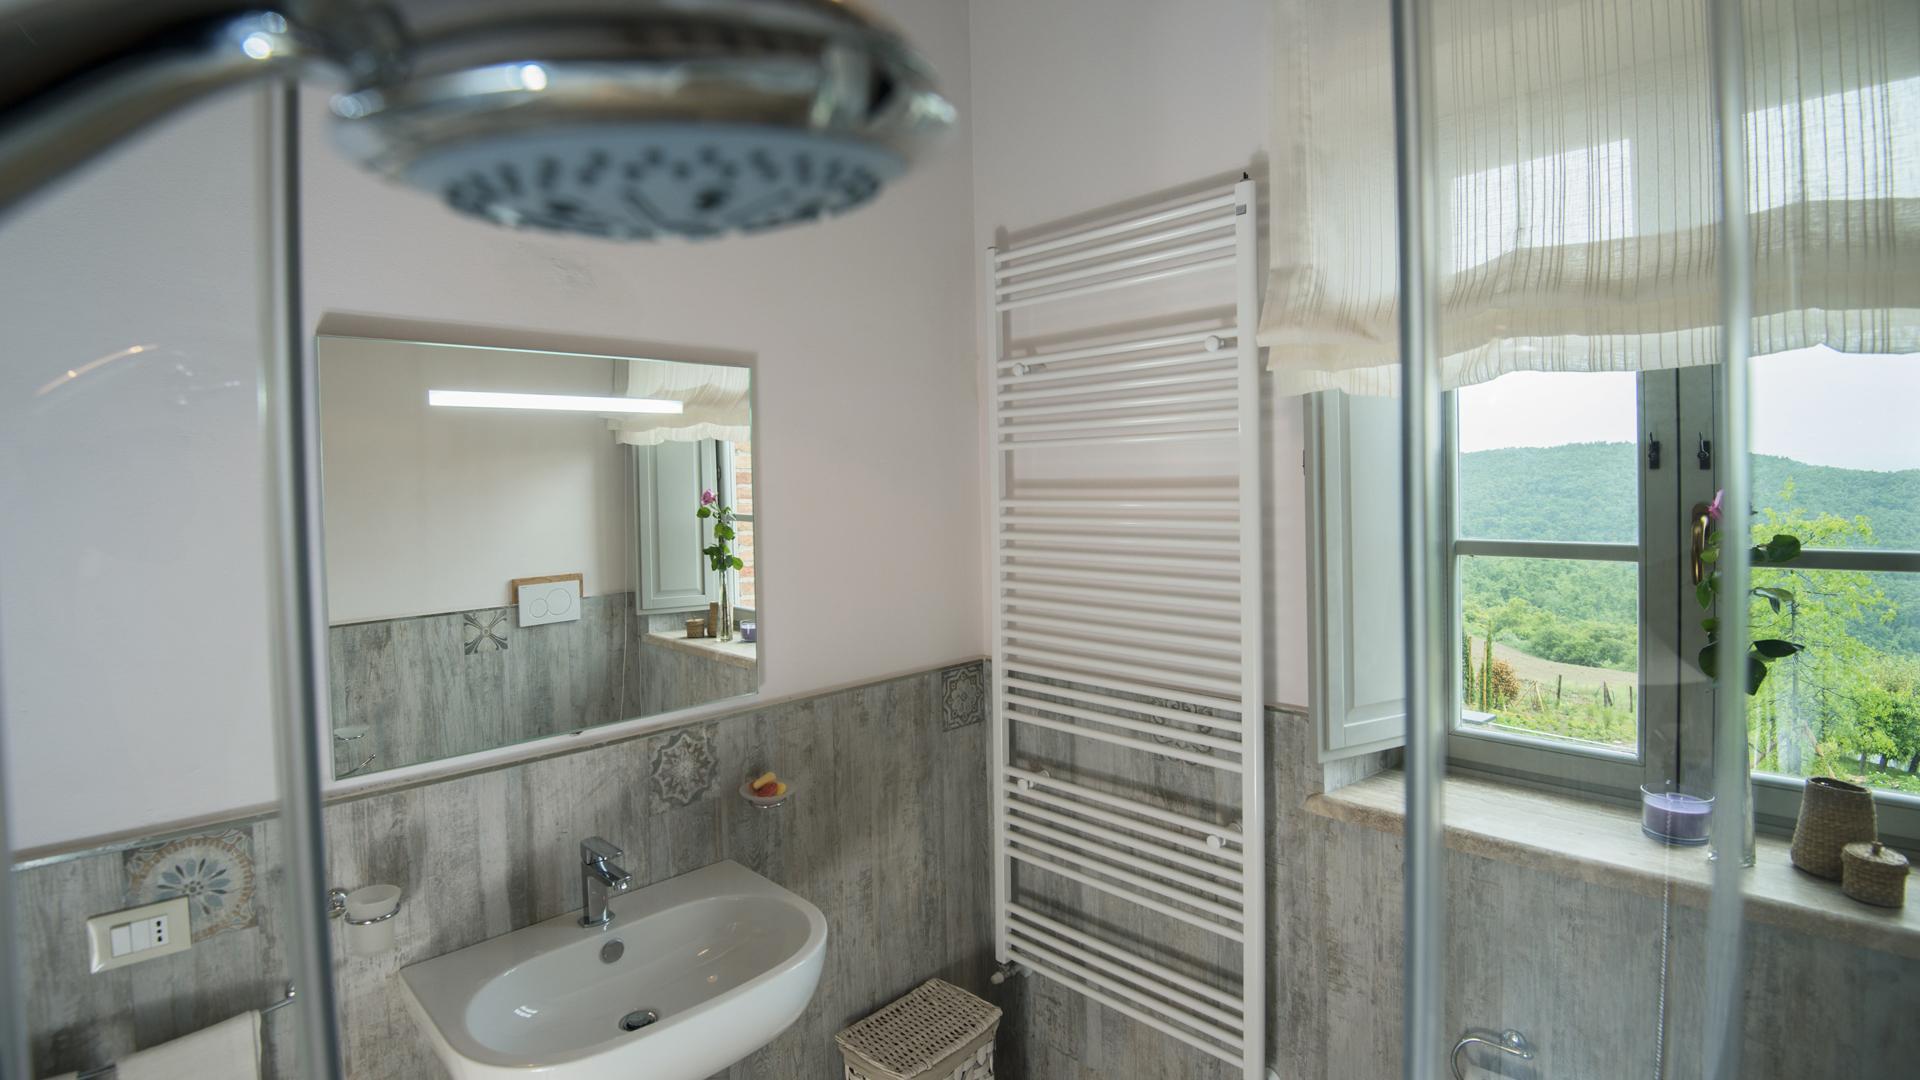 Luxe Villa Badkamer : Badkamer ouders super de luxe picture of villa cavrois croix